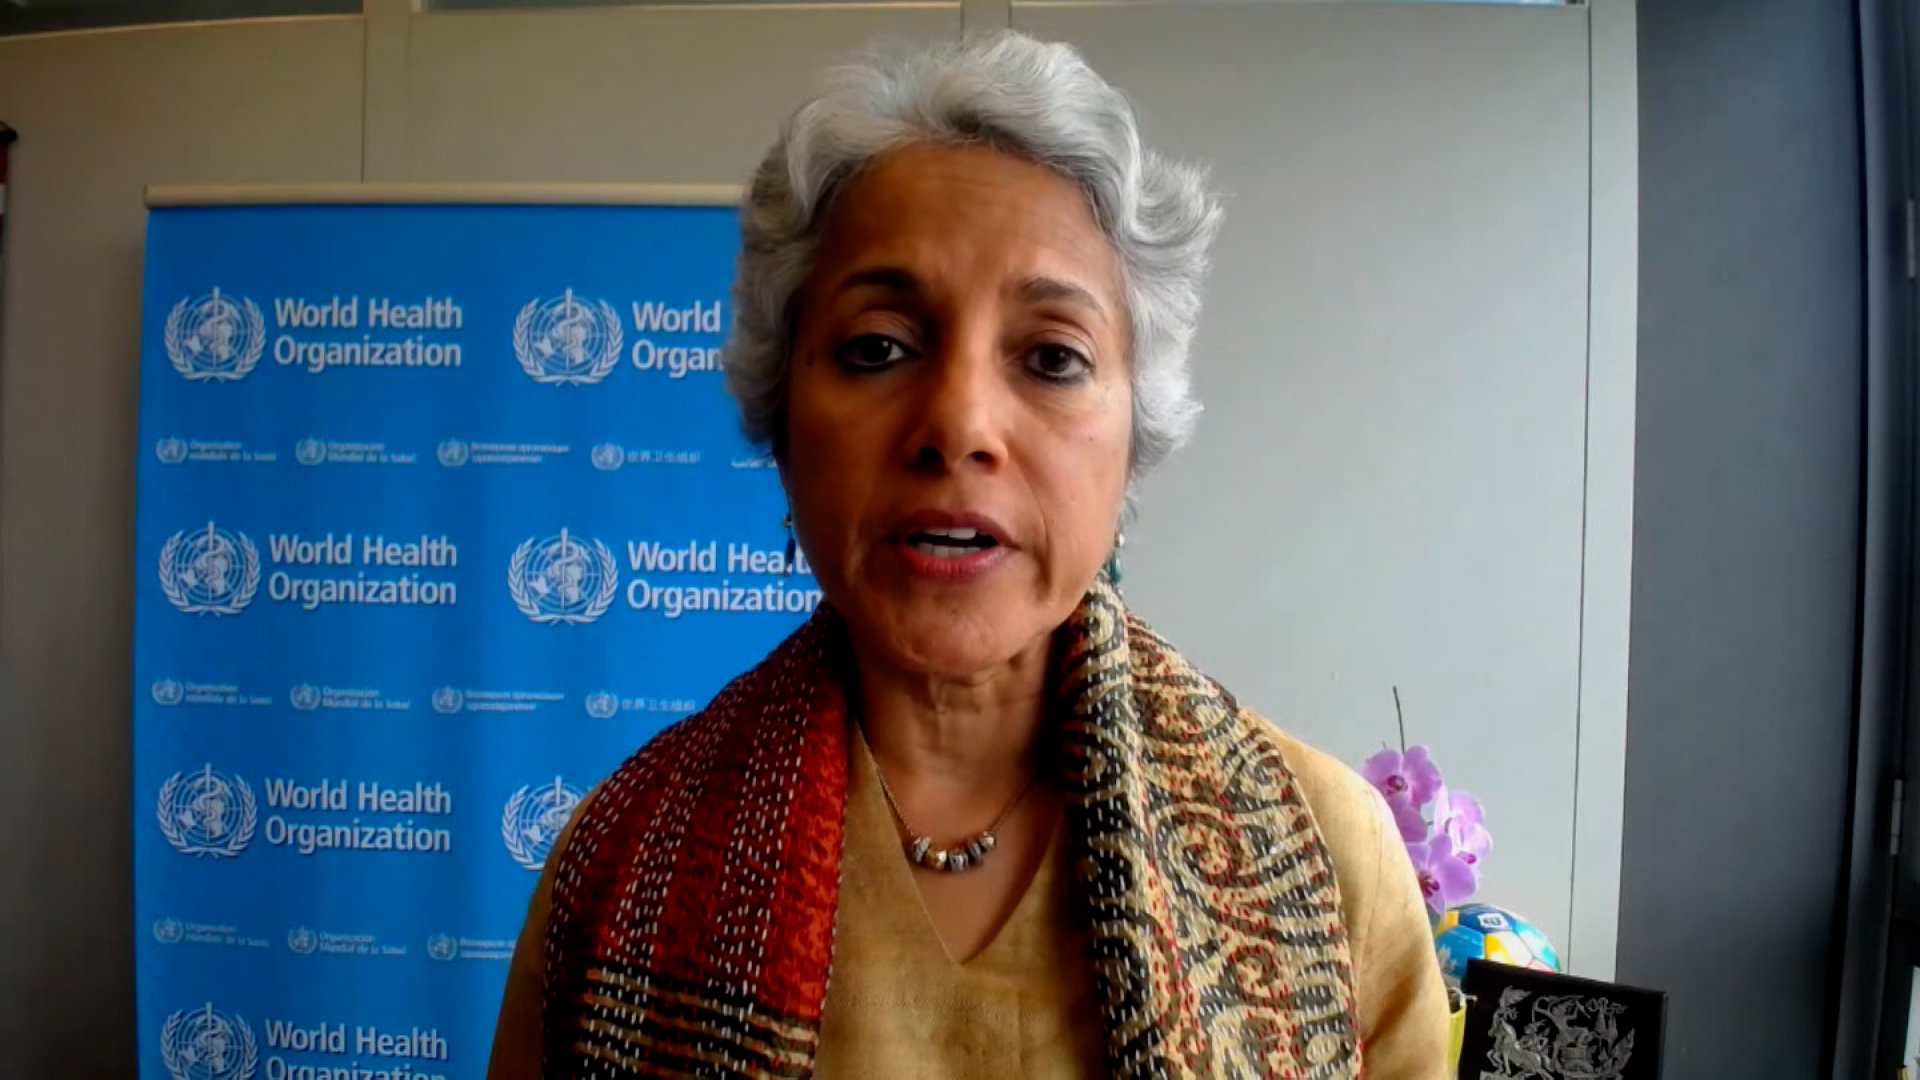 World Health Organization's Chief Scientist Soumya Swaminathan speaks during an interview on April 26.